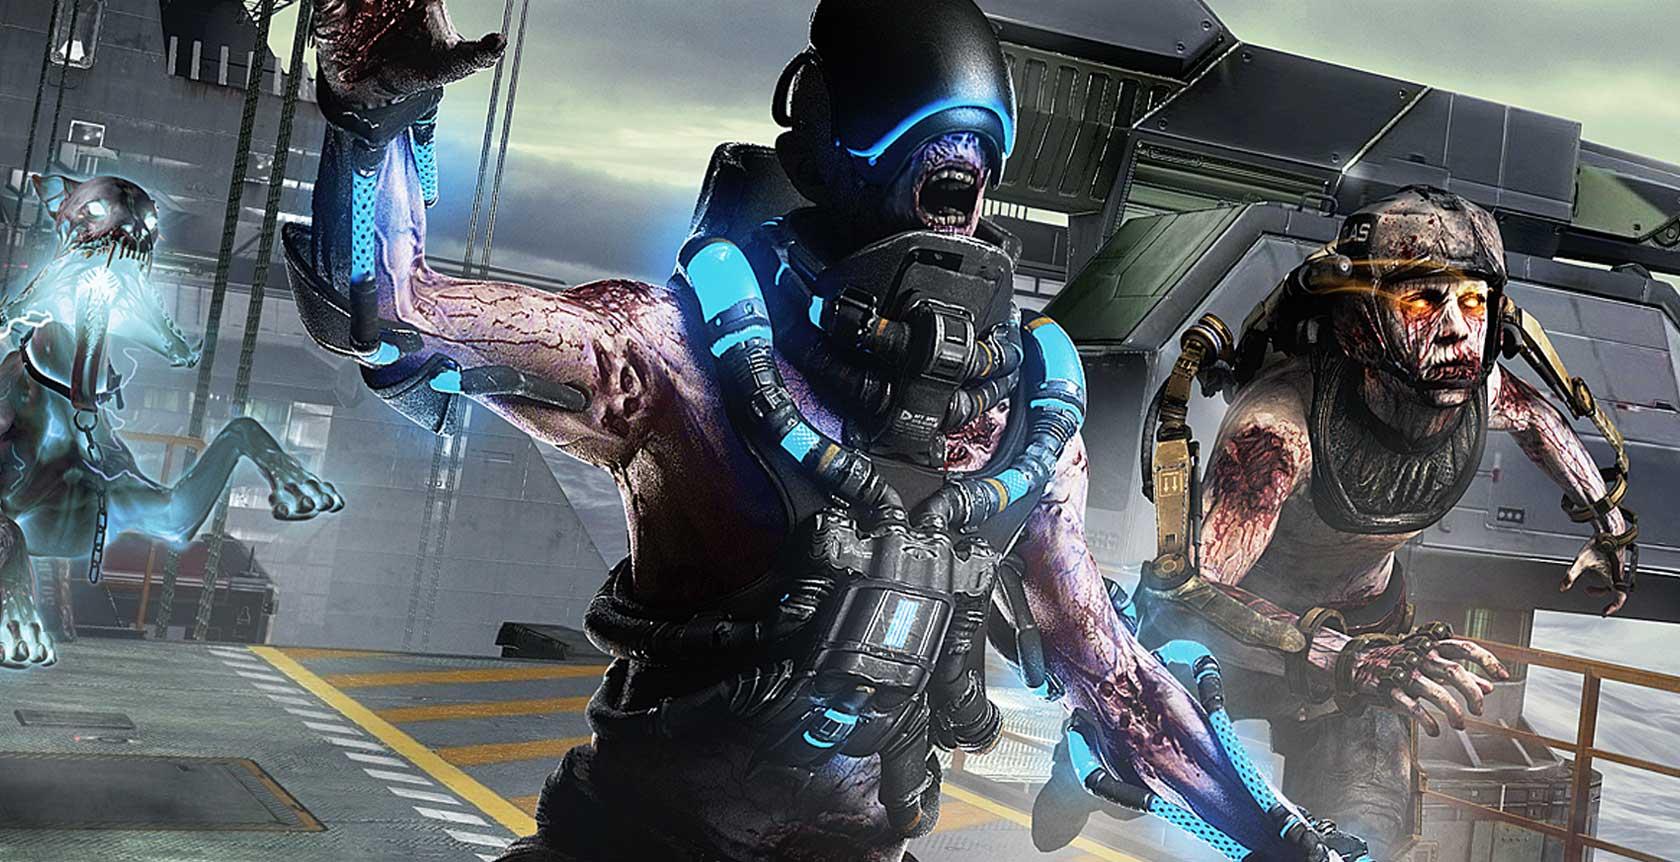 Blinker Call Of Duty Wiki FANDOM Powered By Wikia - Call duty exo zombies trailer looks epic